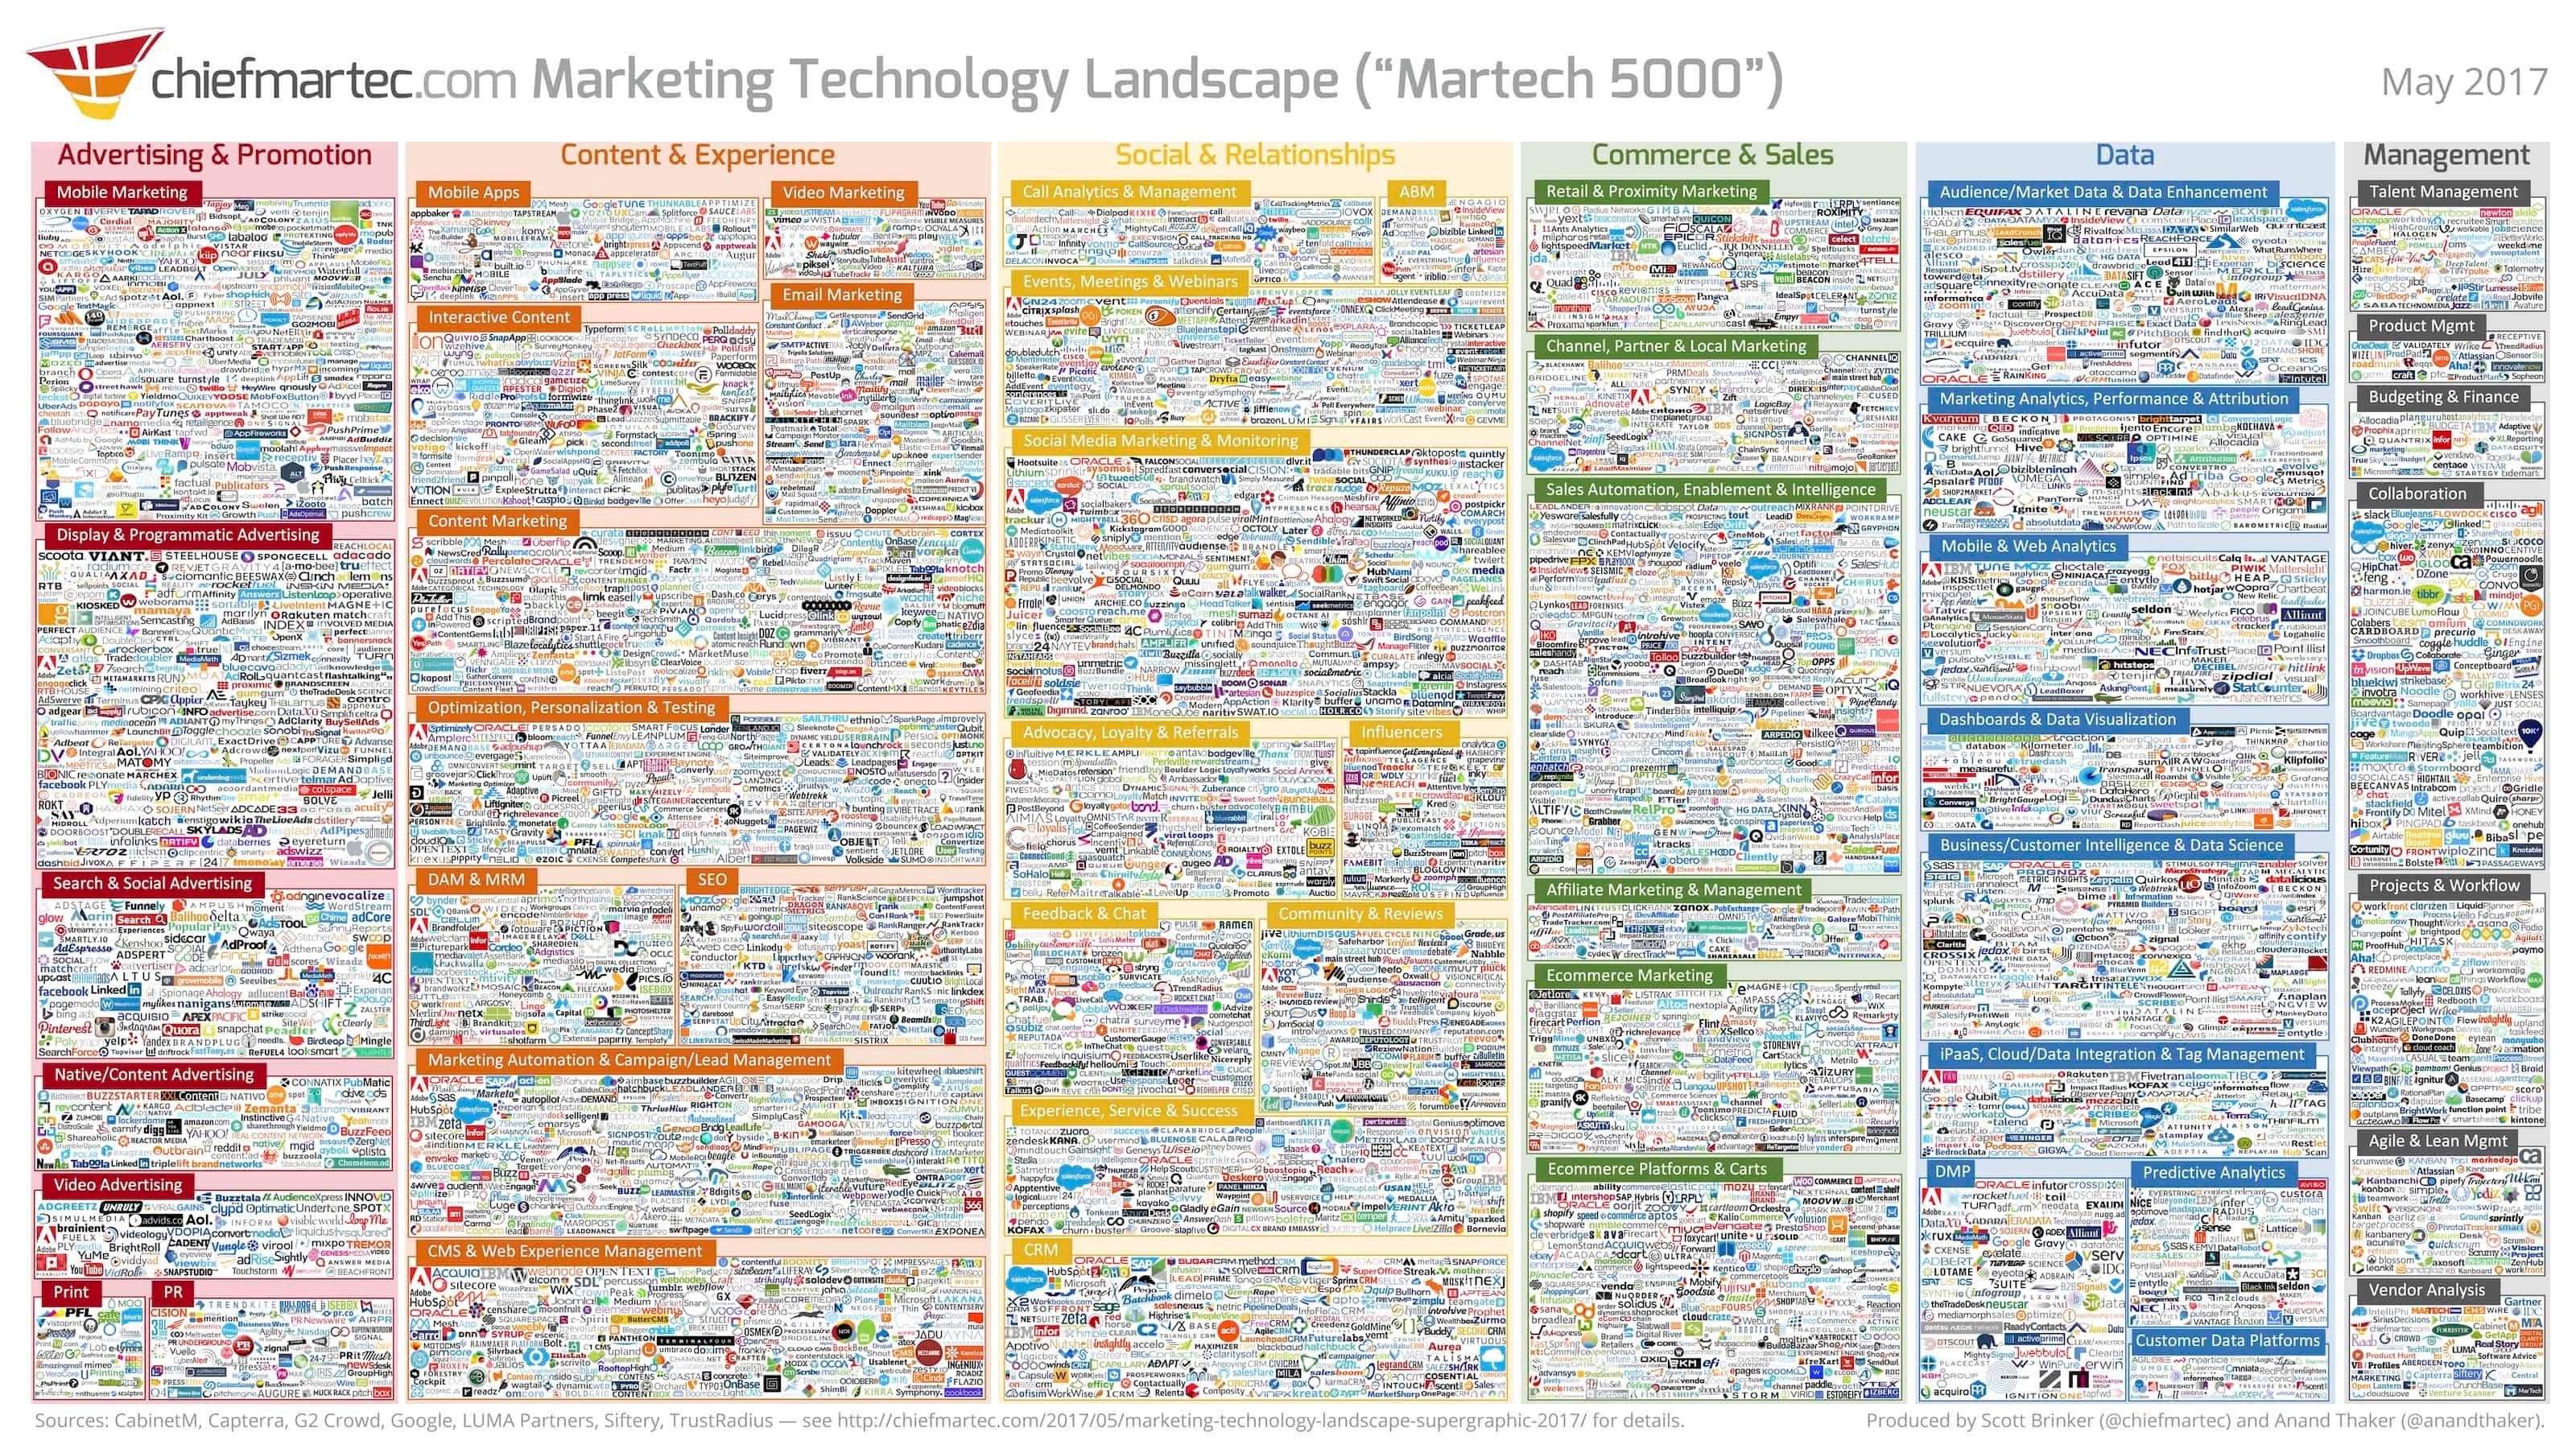 Scott Brinker Marketing Technology Landscape